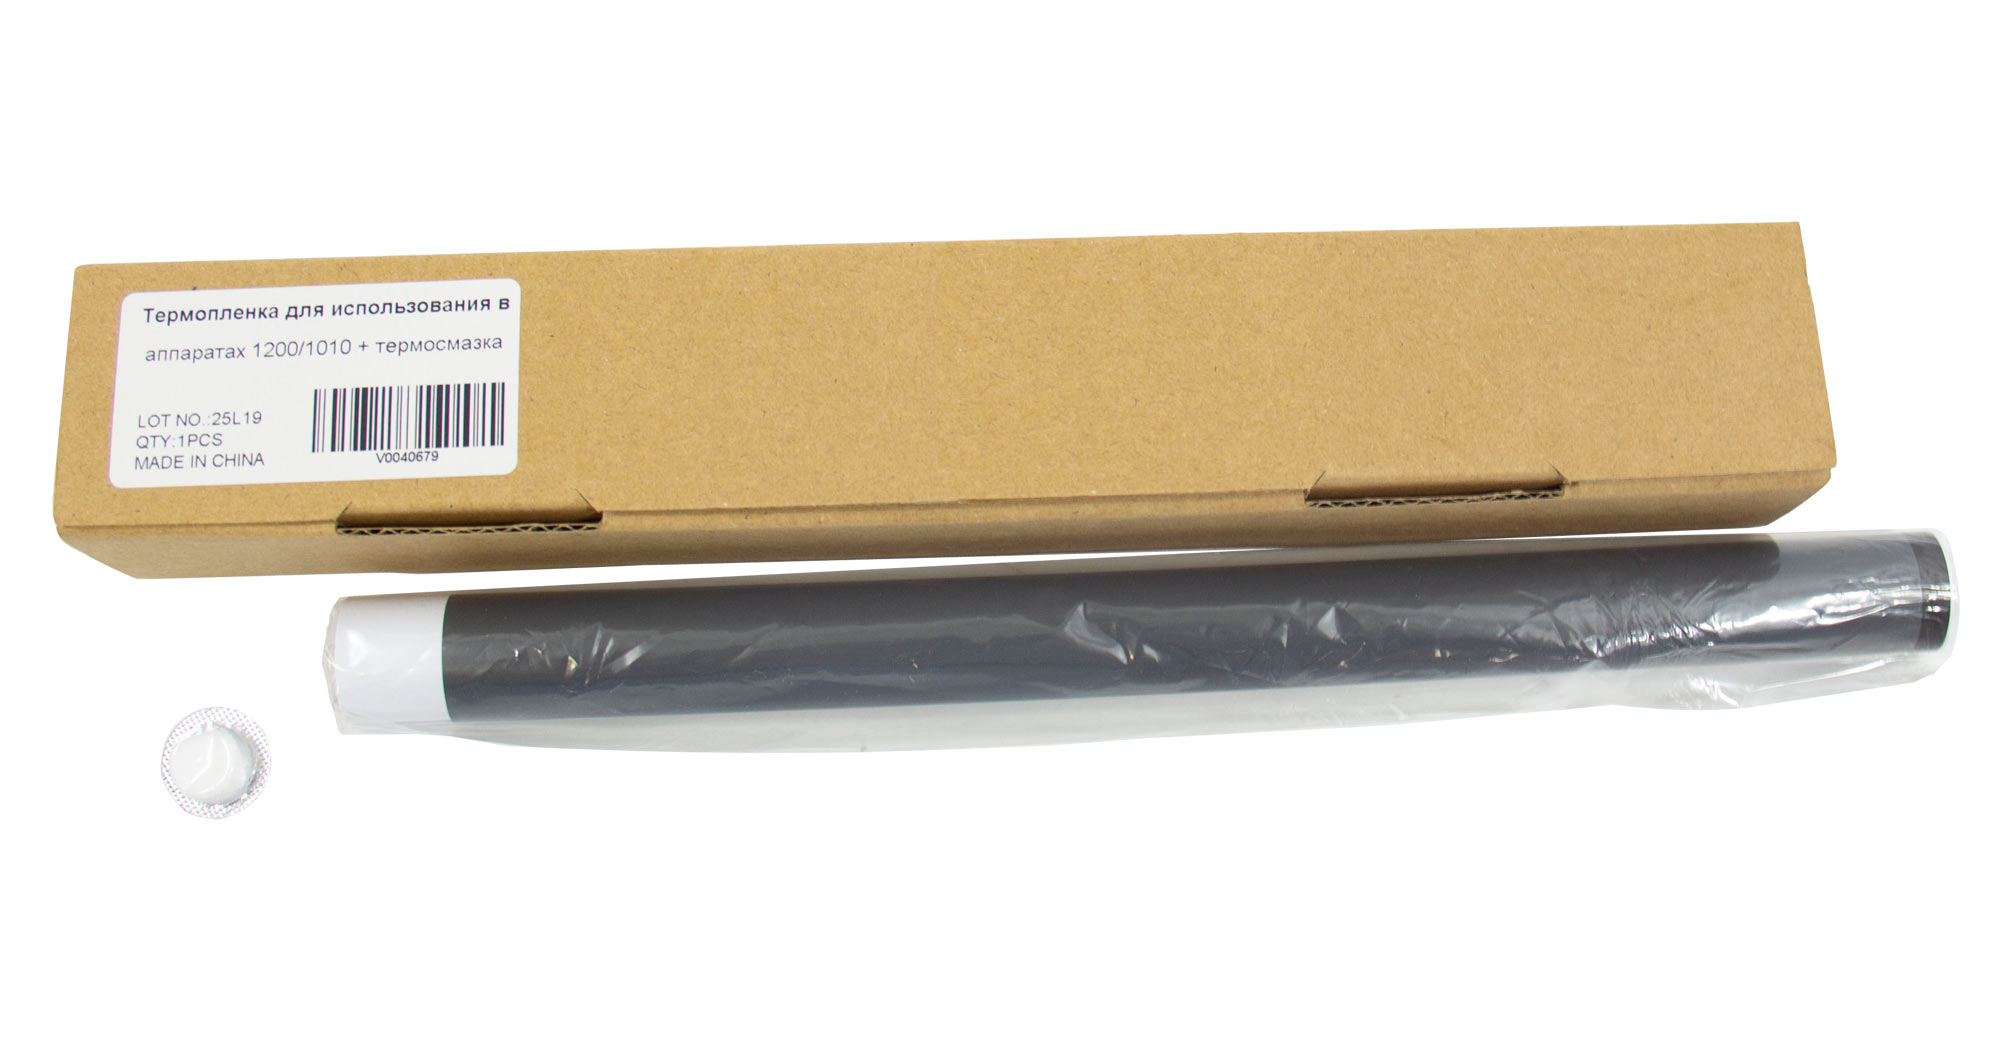 Термопленка HP LJ 1200/1000 + смазка (совм.)